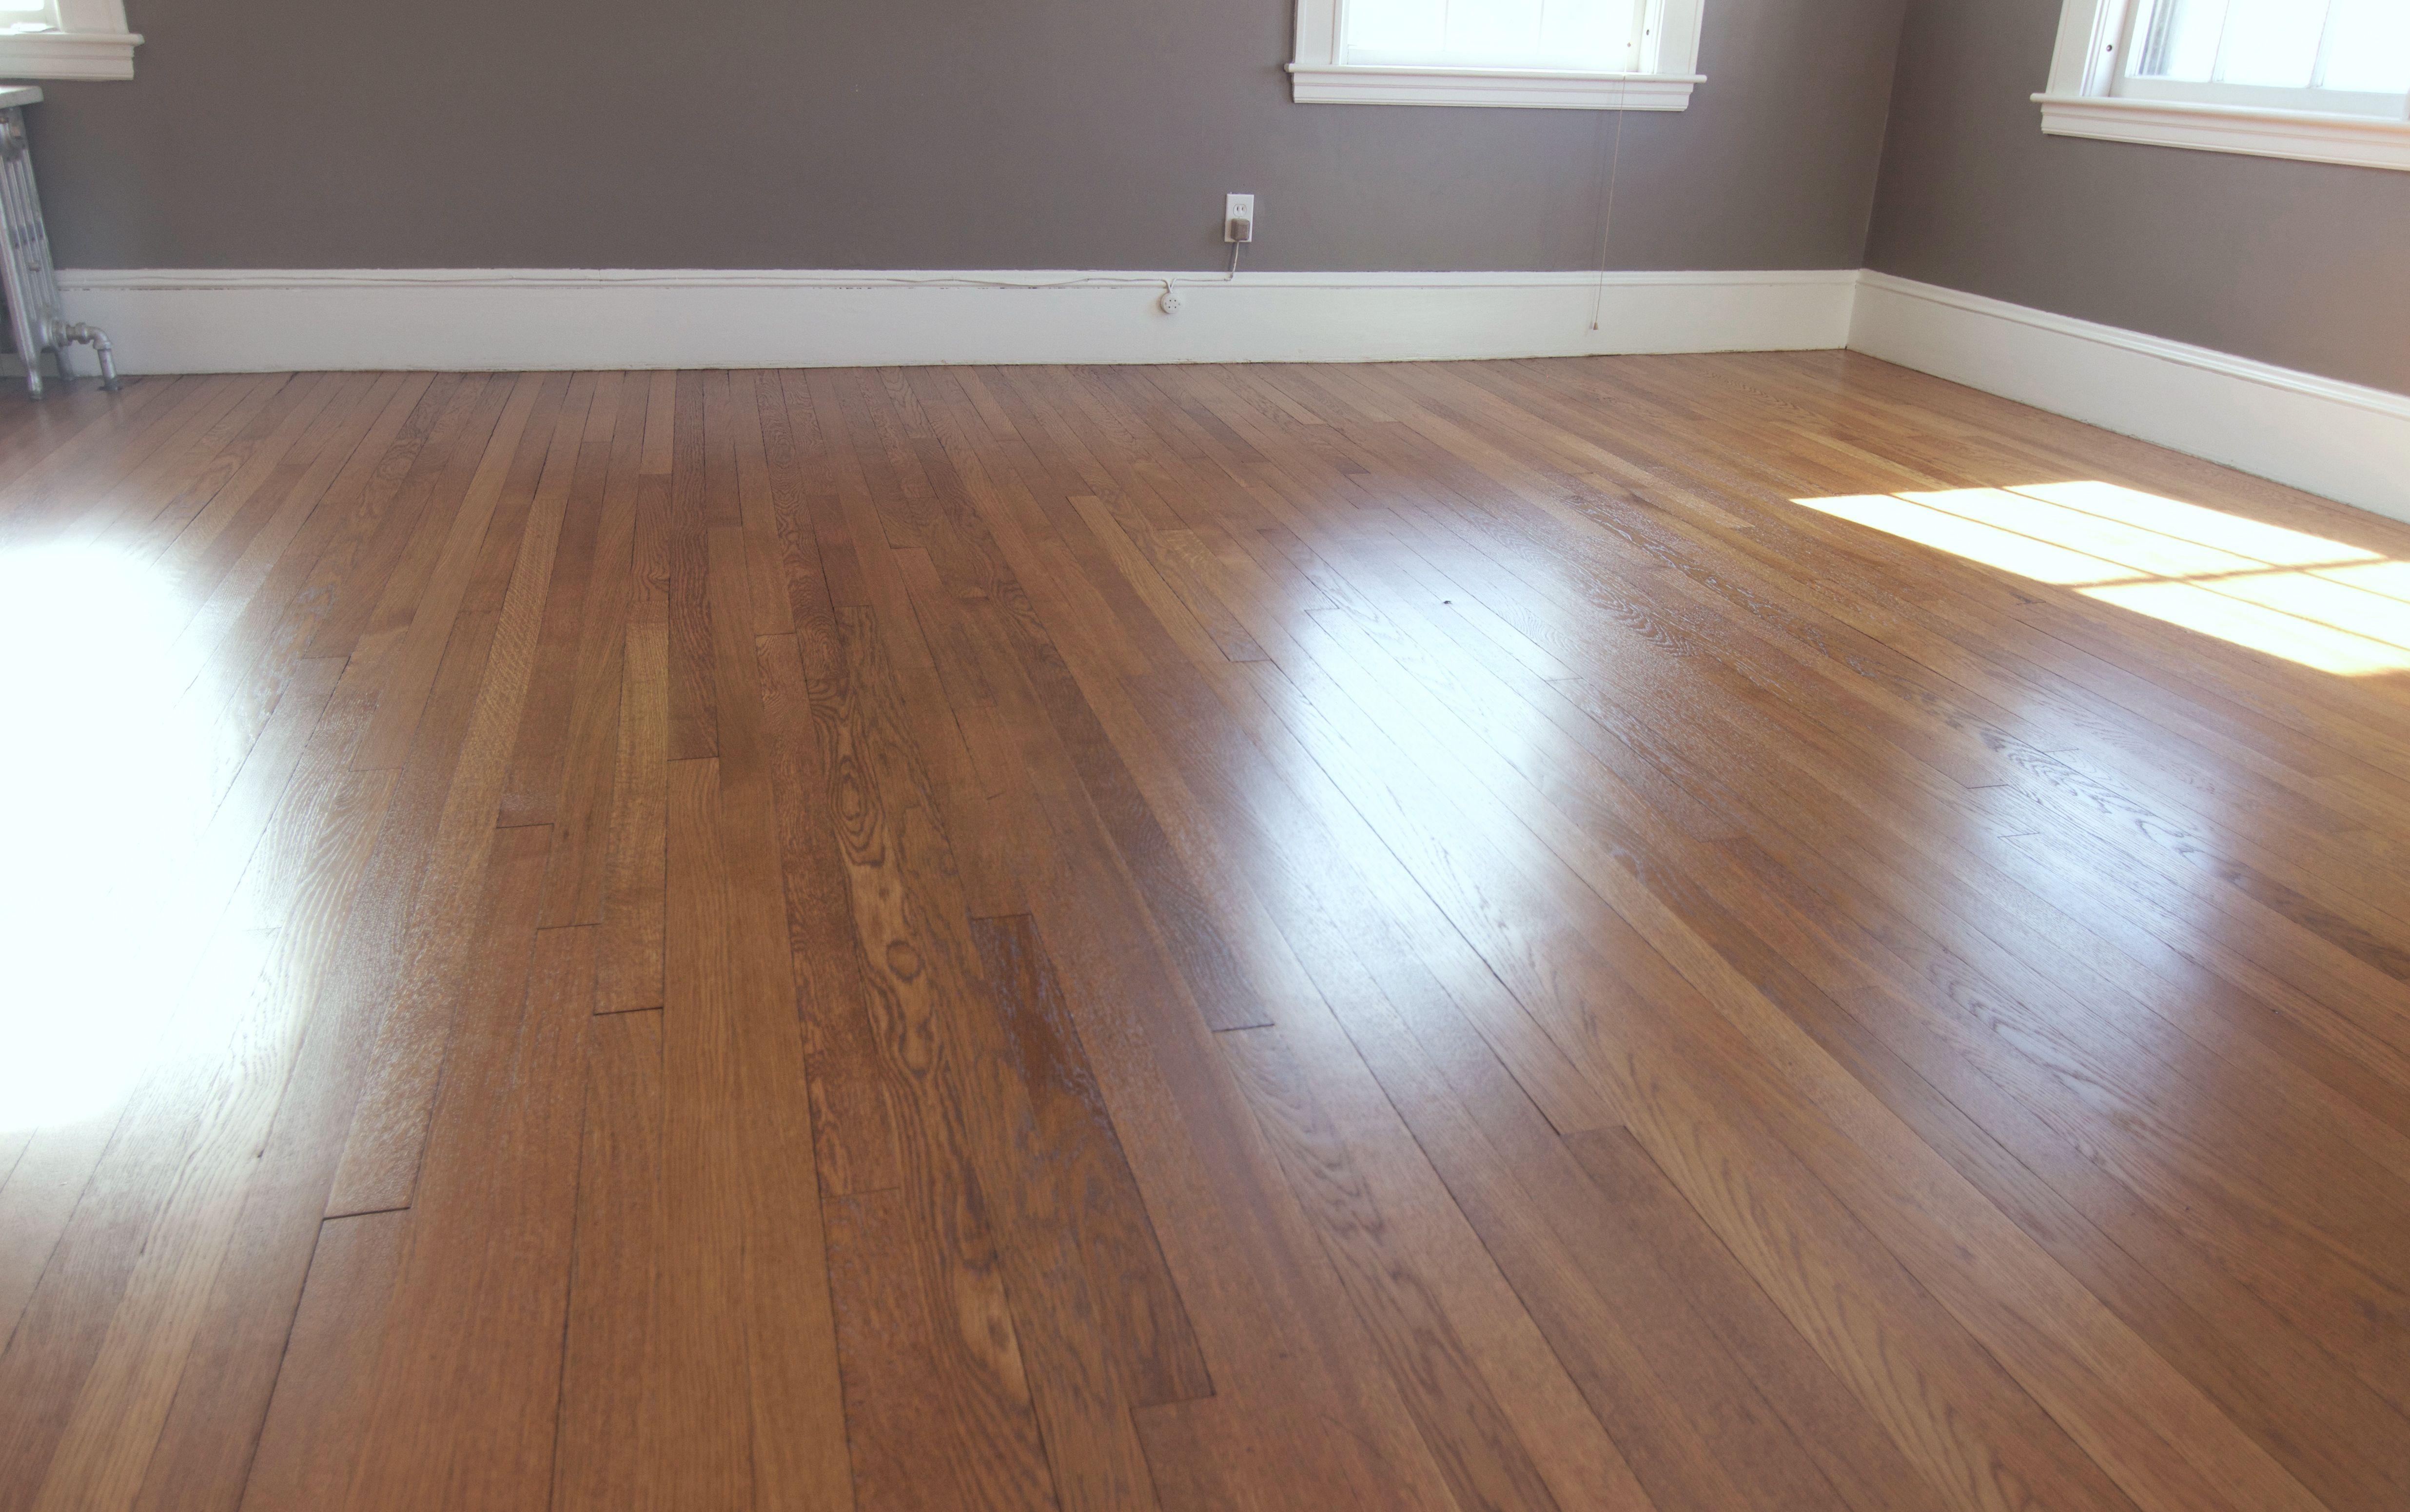 Bona Golden Oak Hardwood Floors White Oak Hardwood Floors Hardwood